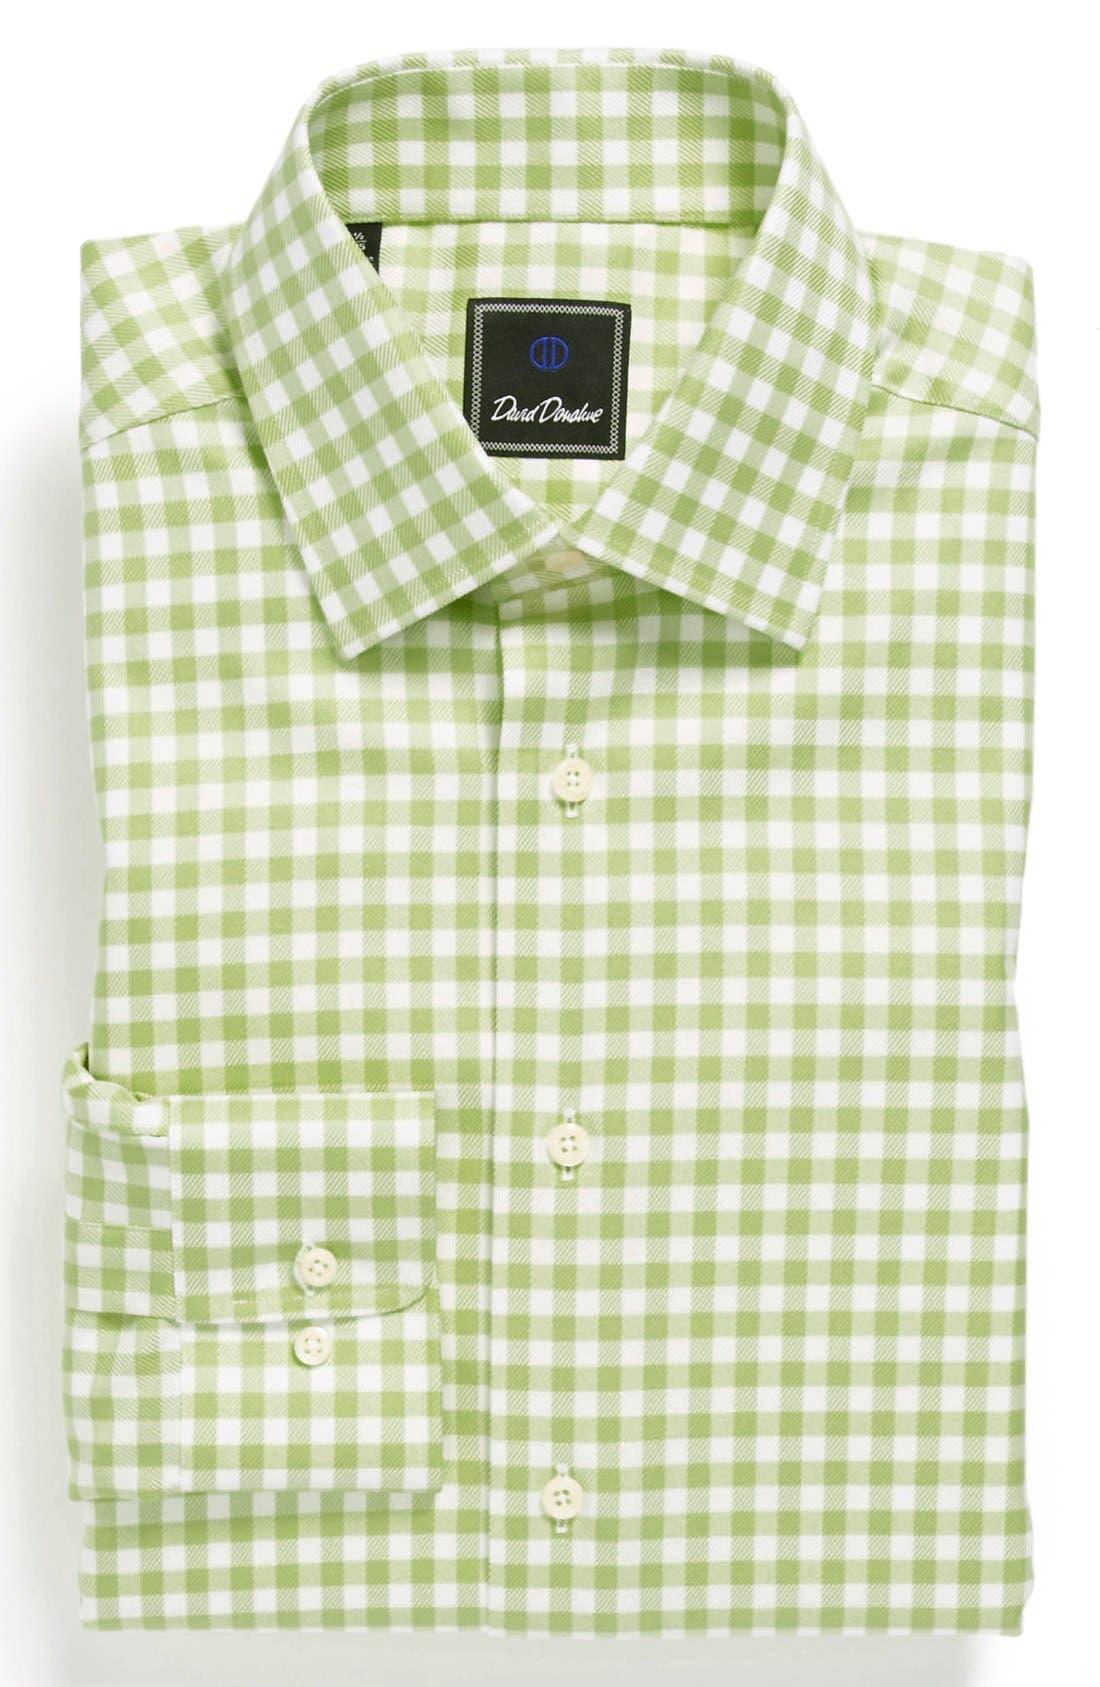 Alternate Image 1 Selected - David Donahue Twill Gingham Regular Fit Dress Shirt